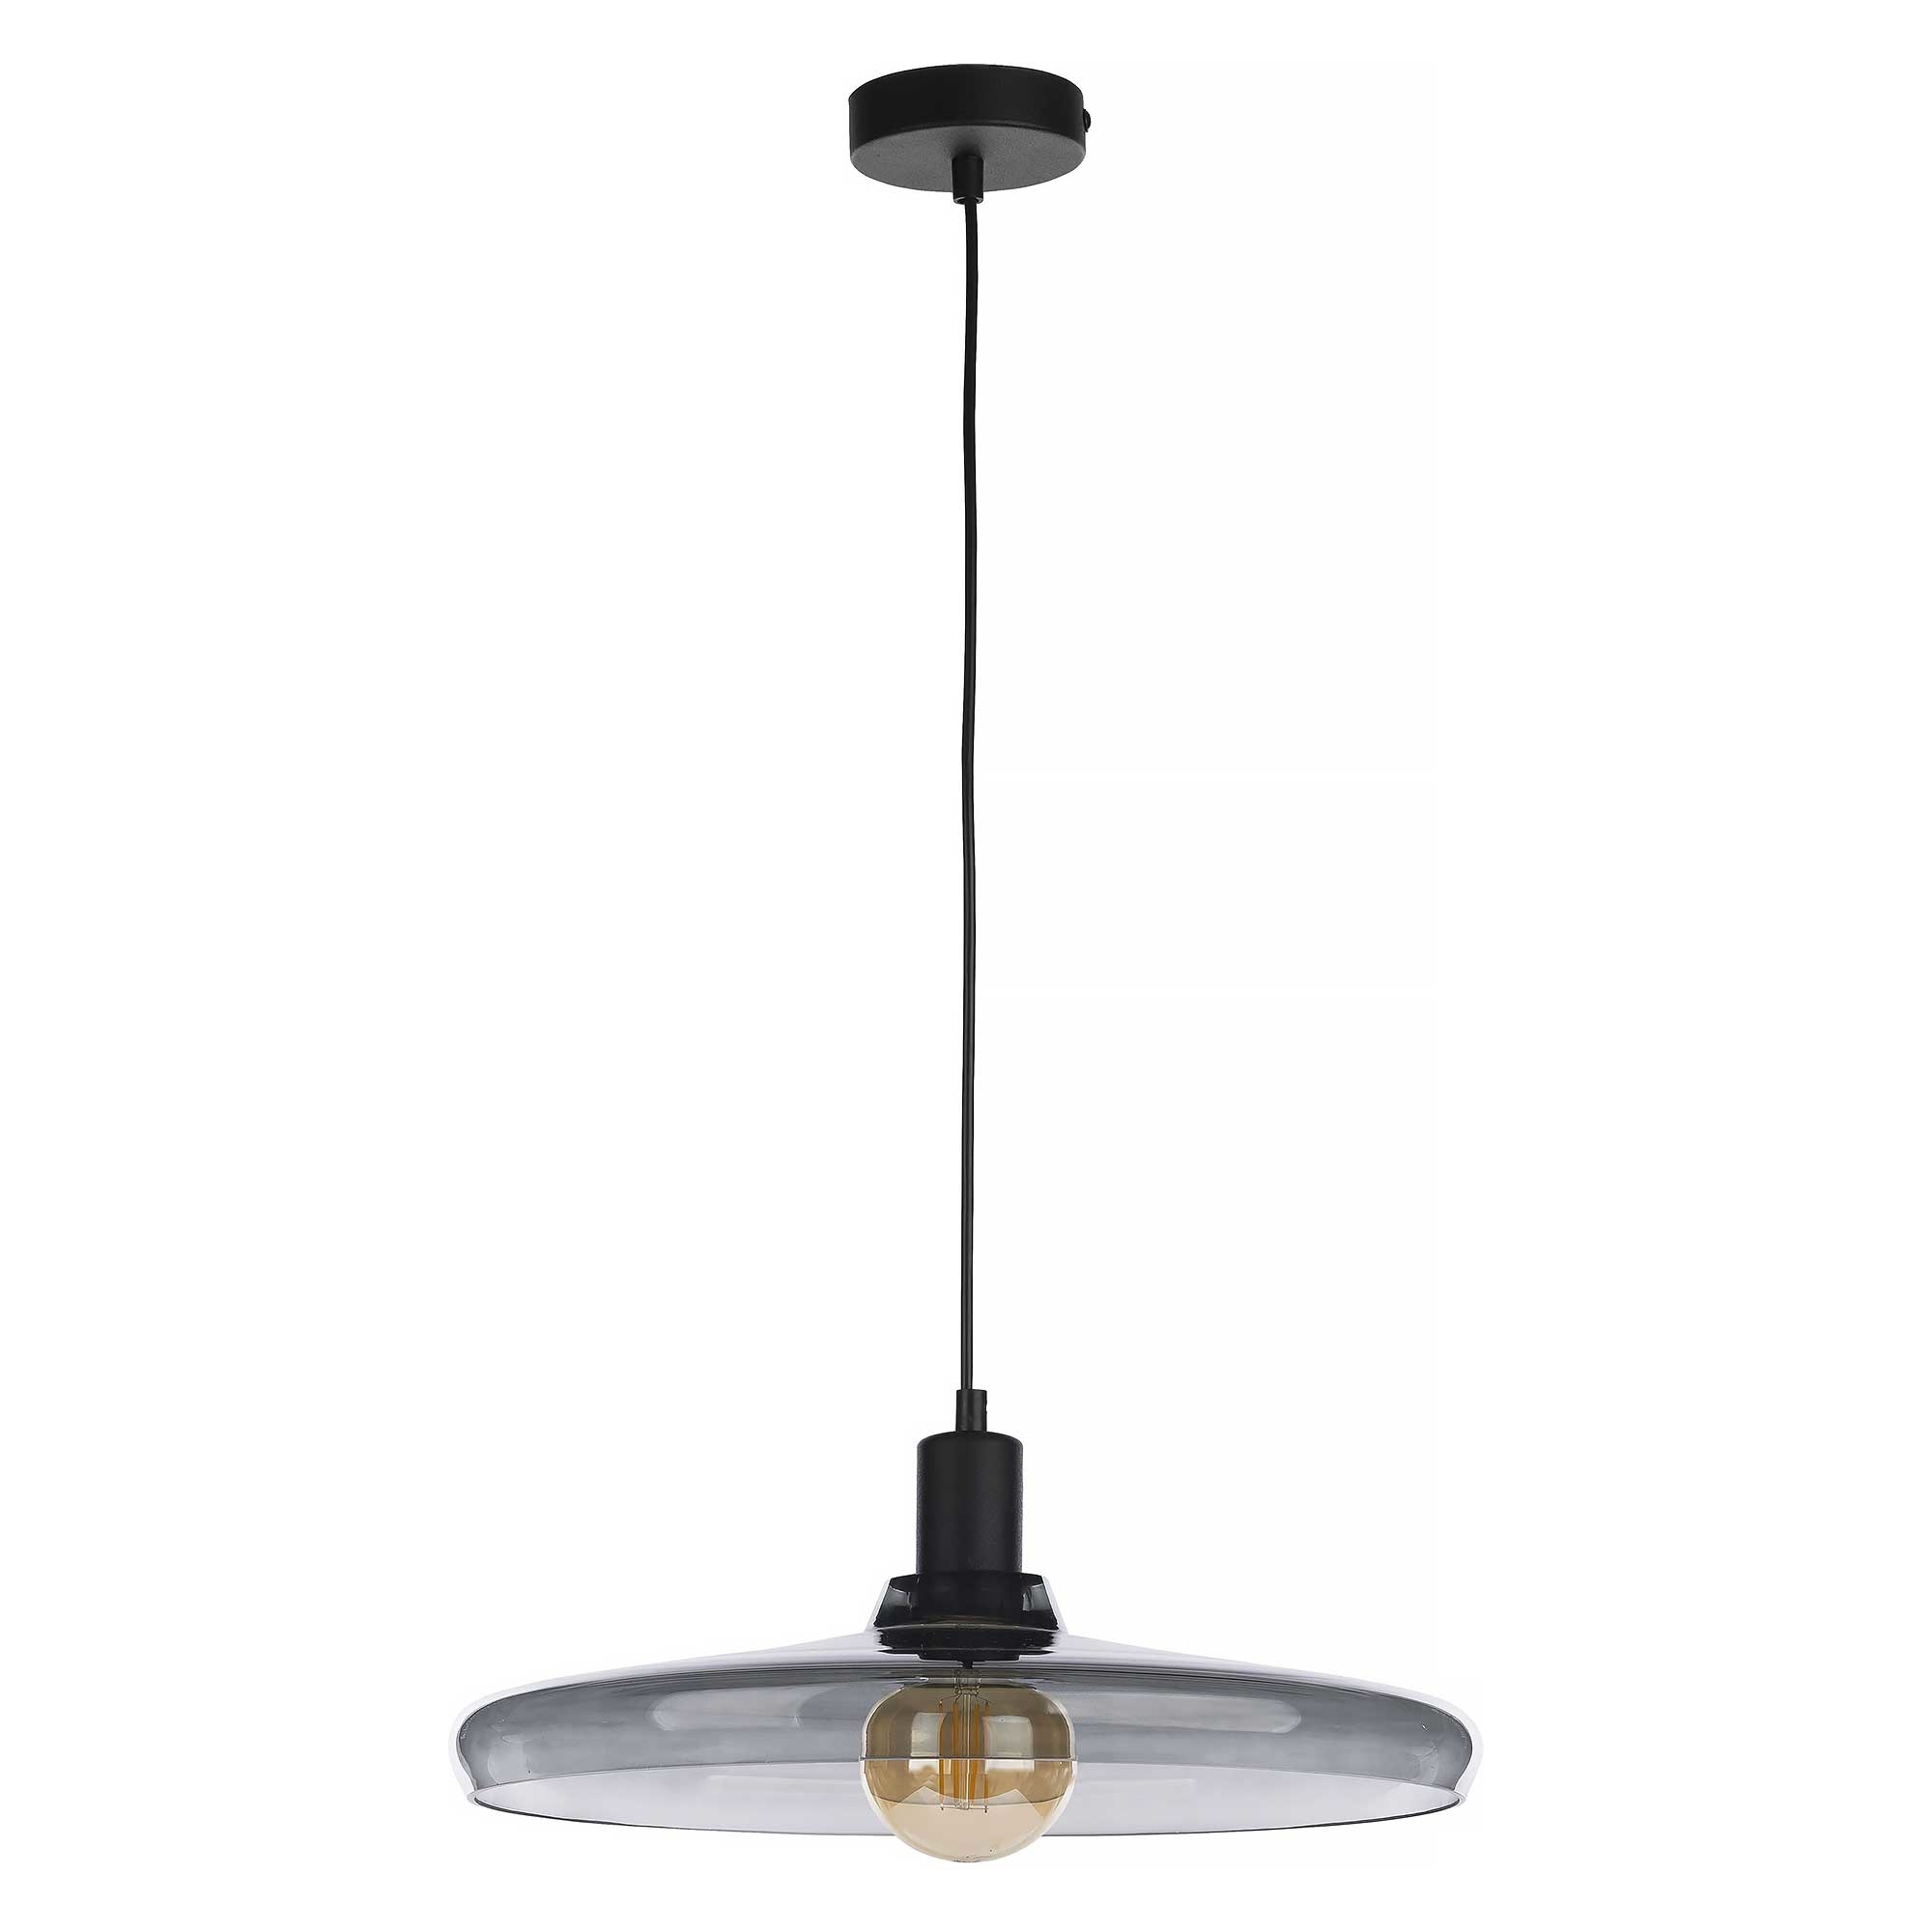 Nowodvorski Hanglamp Libra Ø 40 cm rook zwart